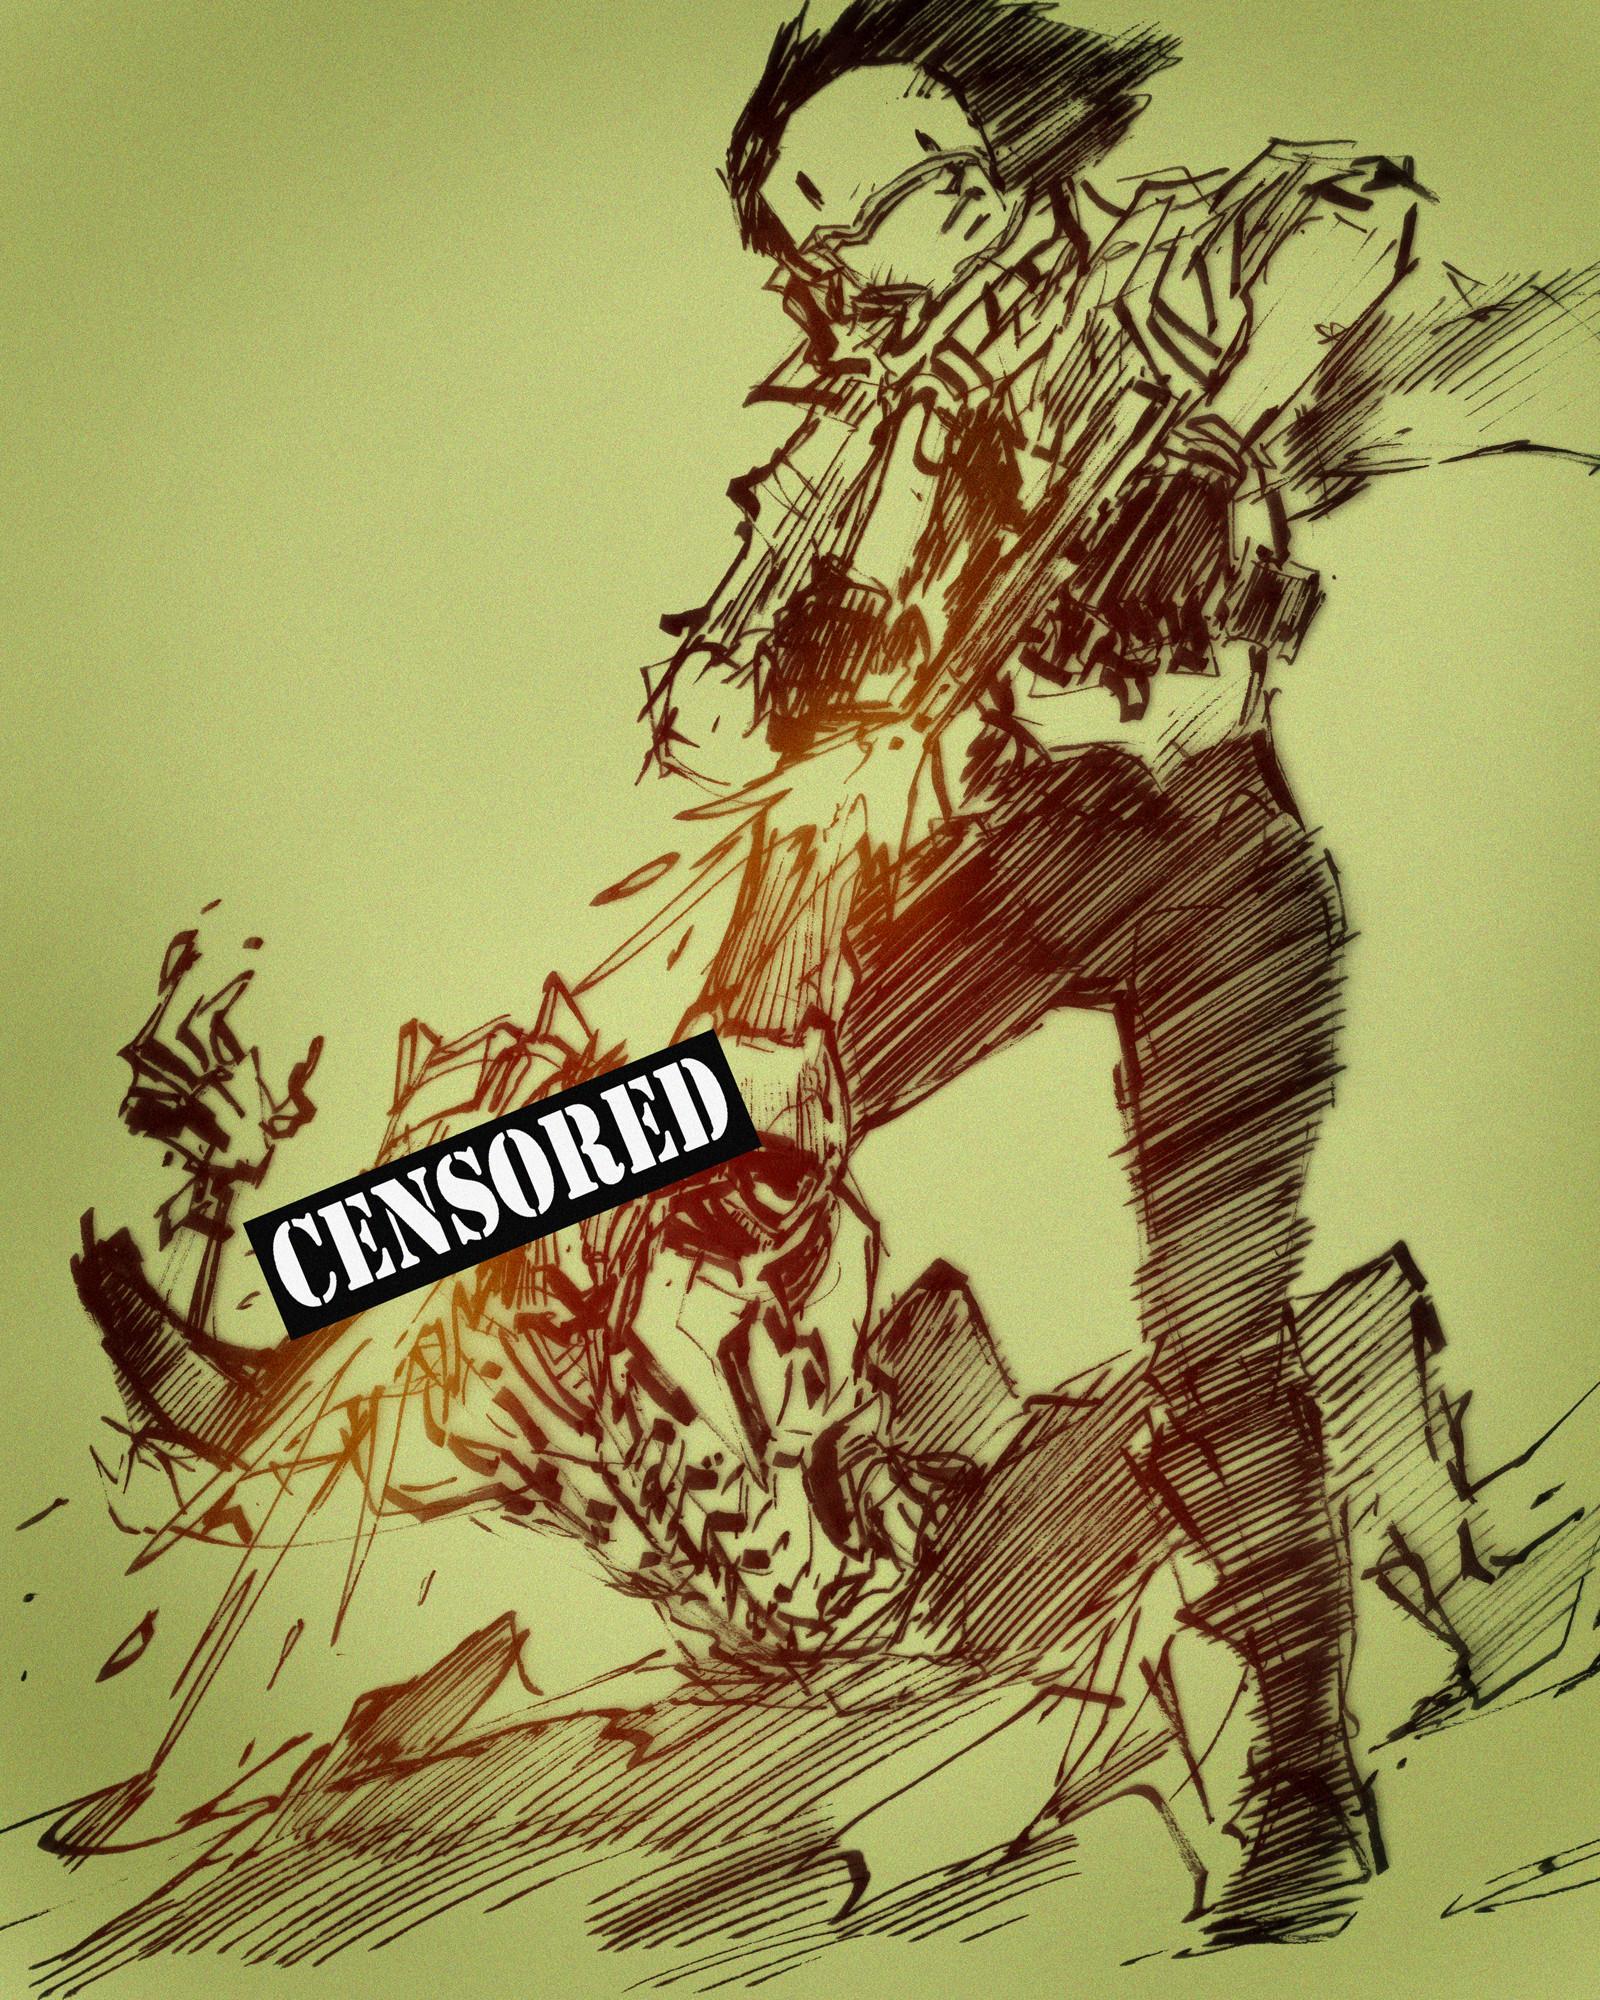 Peter han censored